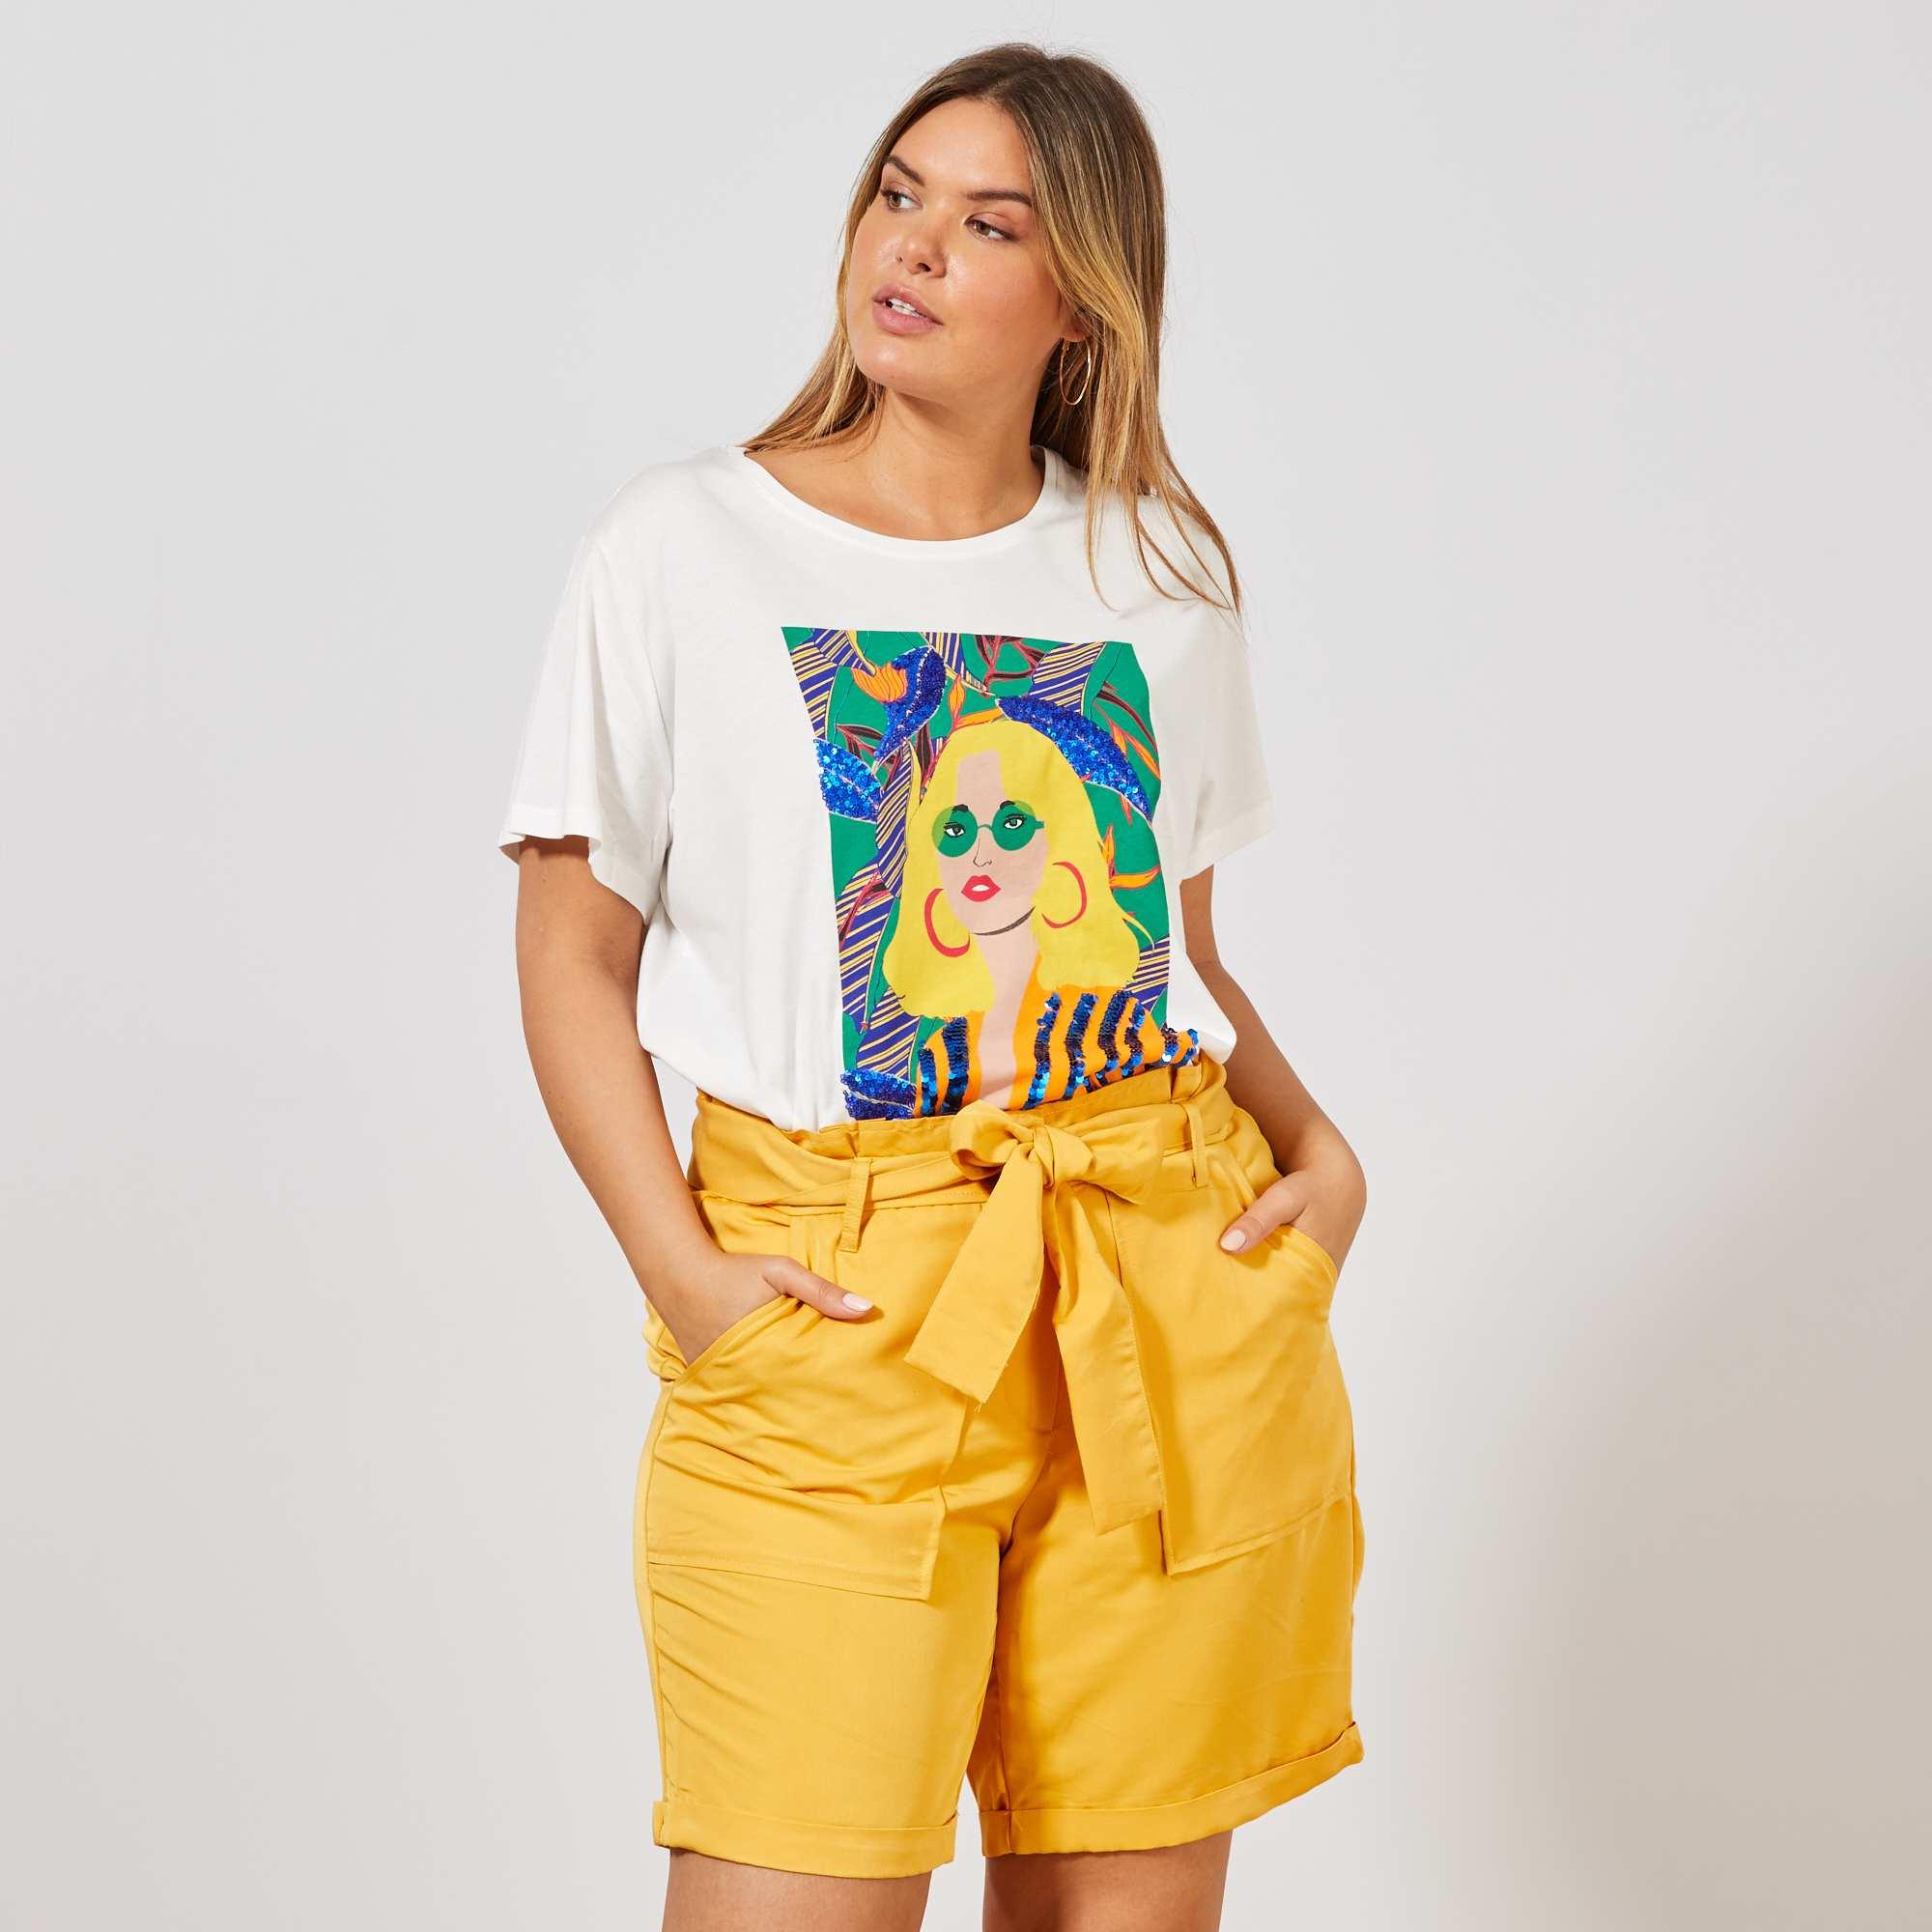 0d243cdc21f7b Short paperbag fluide Grande taille femme - jaune - Kiabi - 18,00€